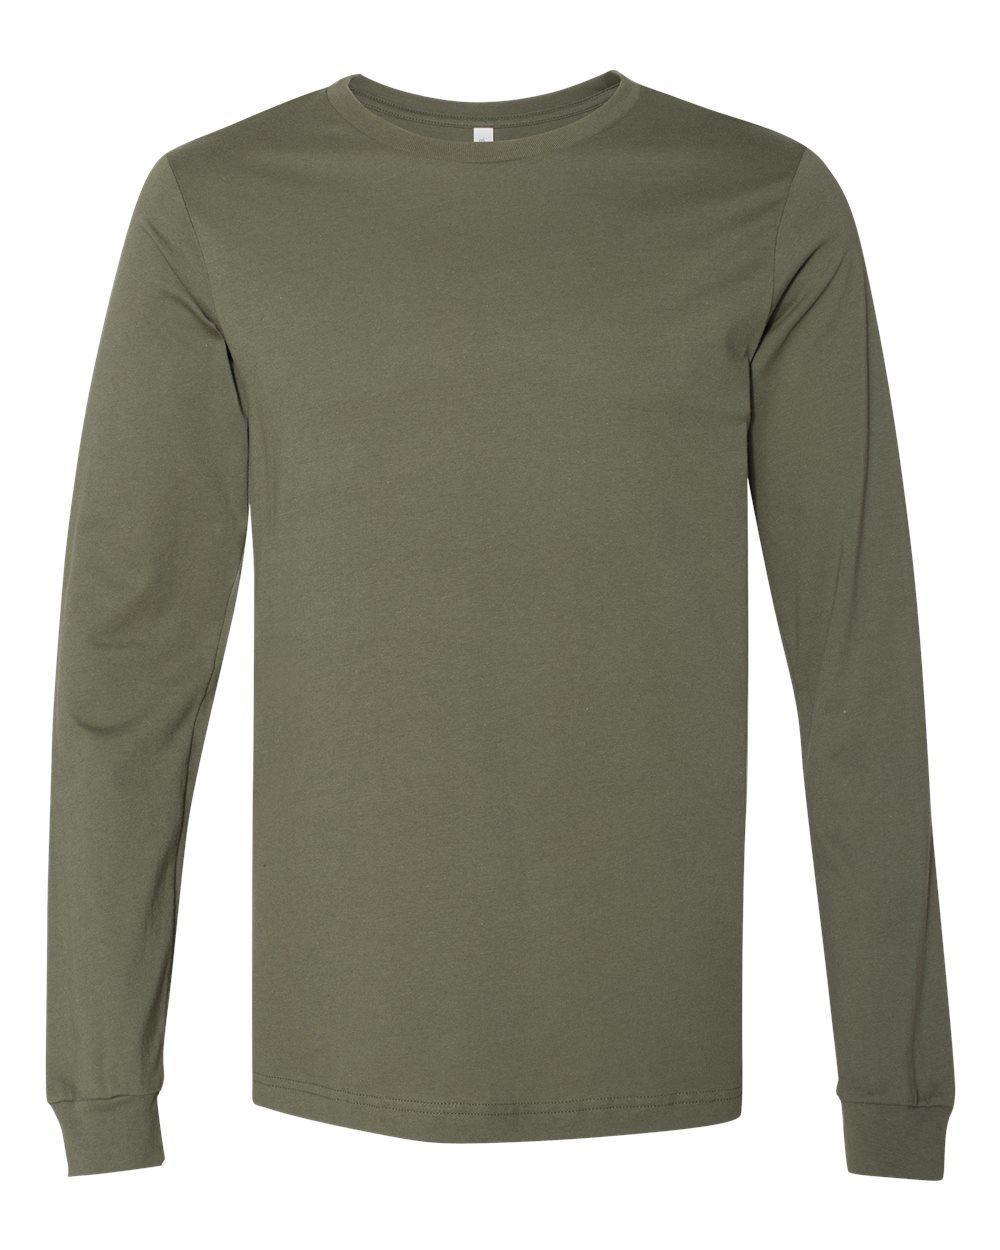 Bella-Canvas-Mens-Blank-Top-Long-Sleeve-Jersey-Tee-T-Shirt-3501-up-to-3XL thumbnail 82